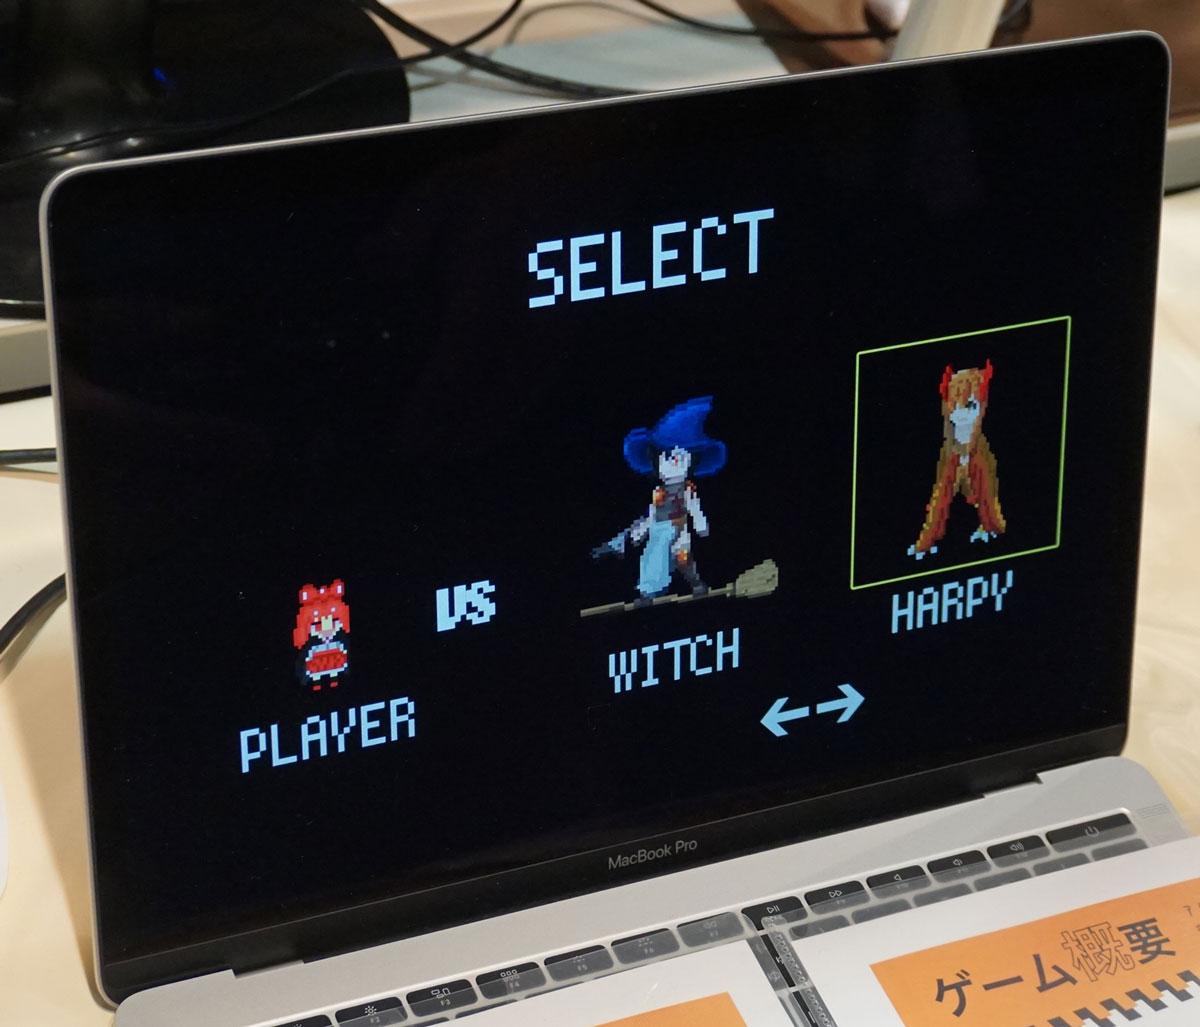 VTuberがゲーム制作!? ターン制アクションバトル『おあめどみねぃてぃんぐ』【TOKYO SANDBOX 2018】